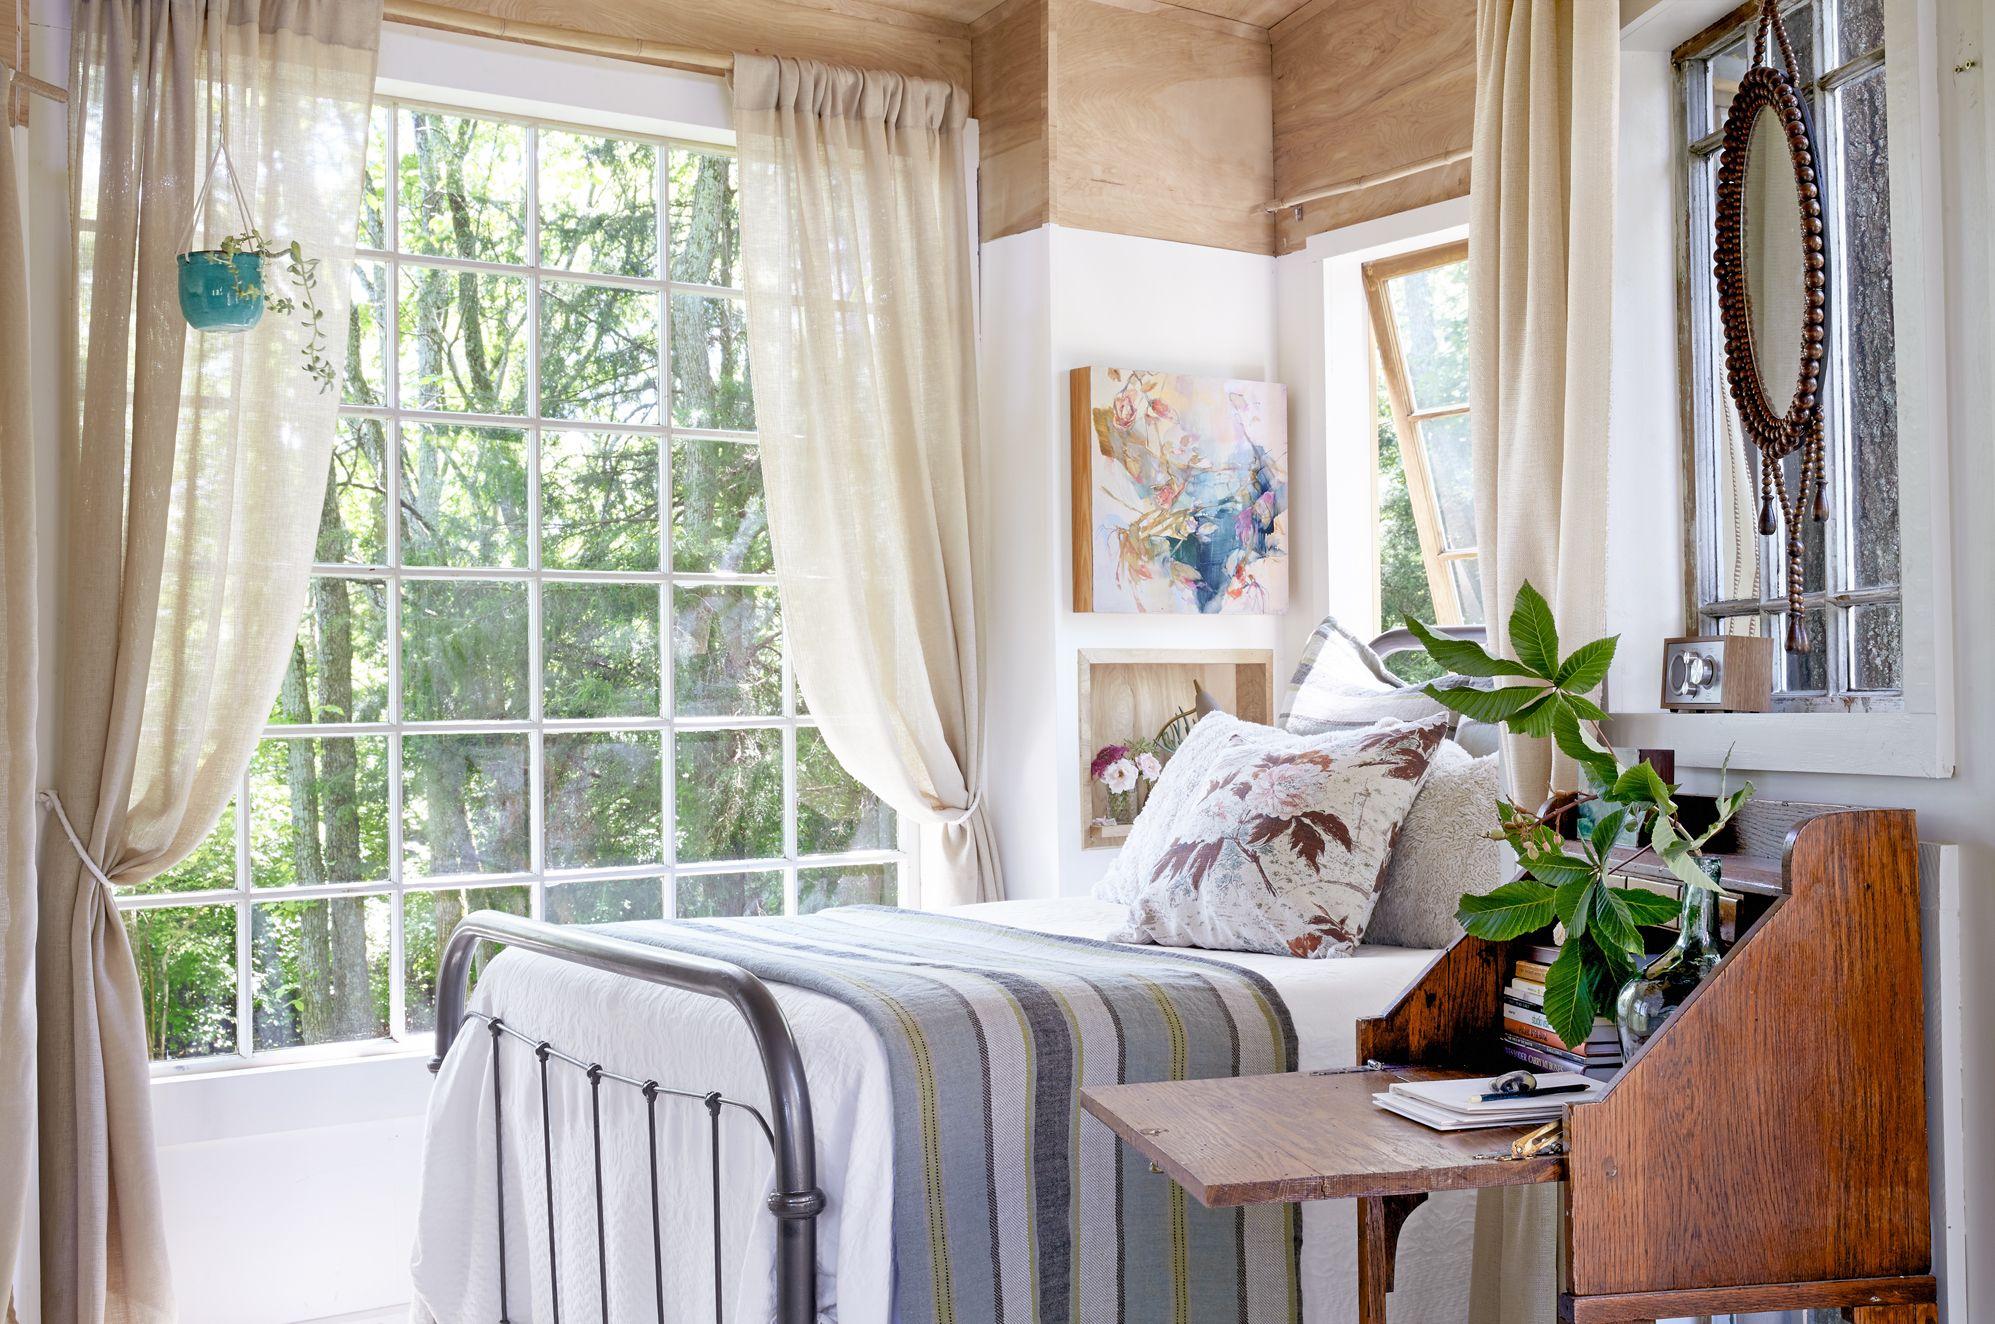 Antique Bedroom Ideas with Vintage Classy Designs